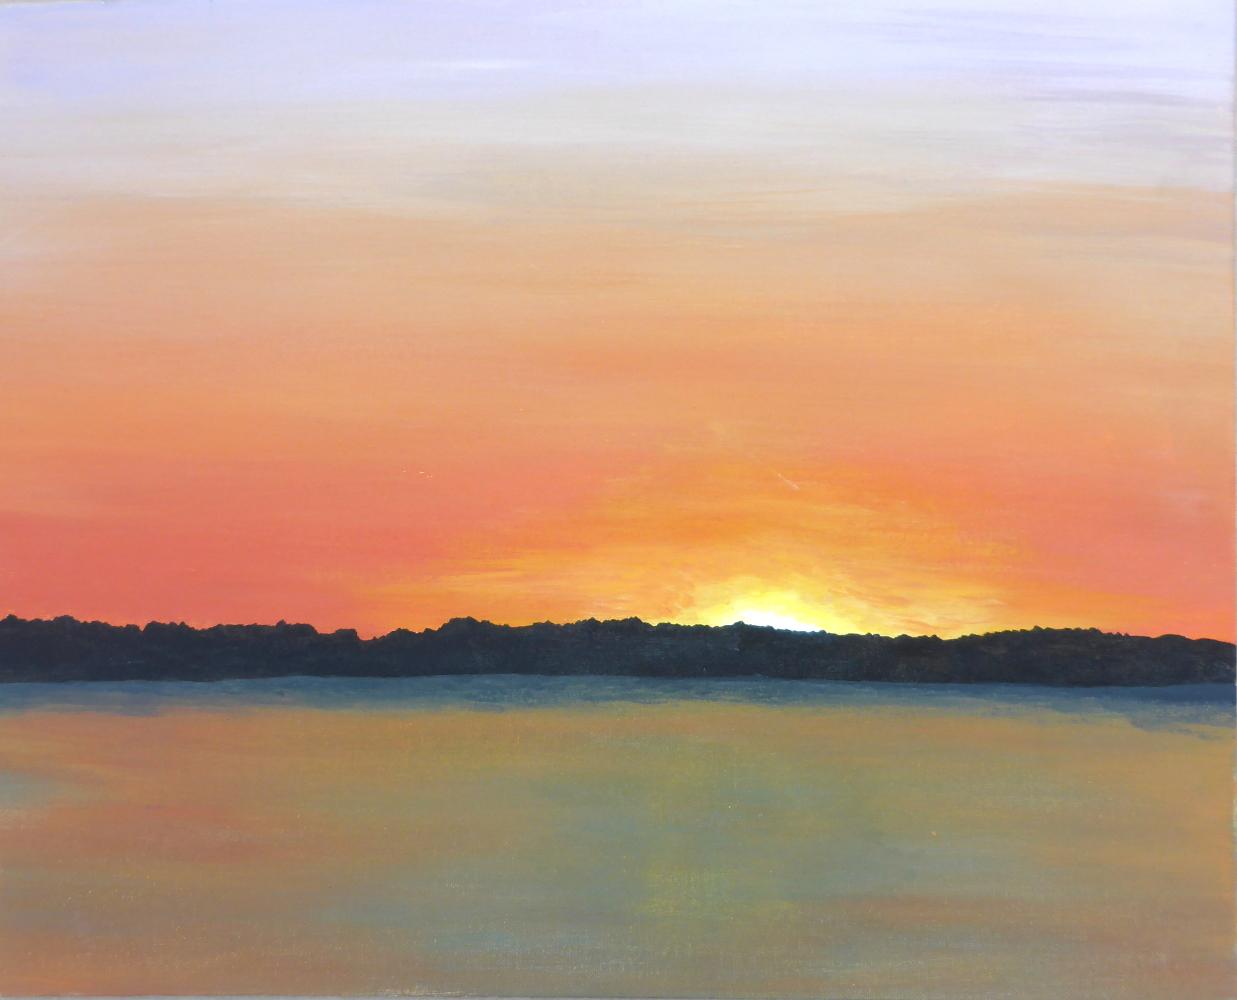 """Sunset"", 2018, acrylic on cardboard, 50 x 40 cm"